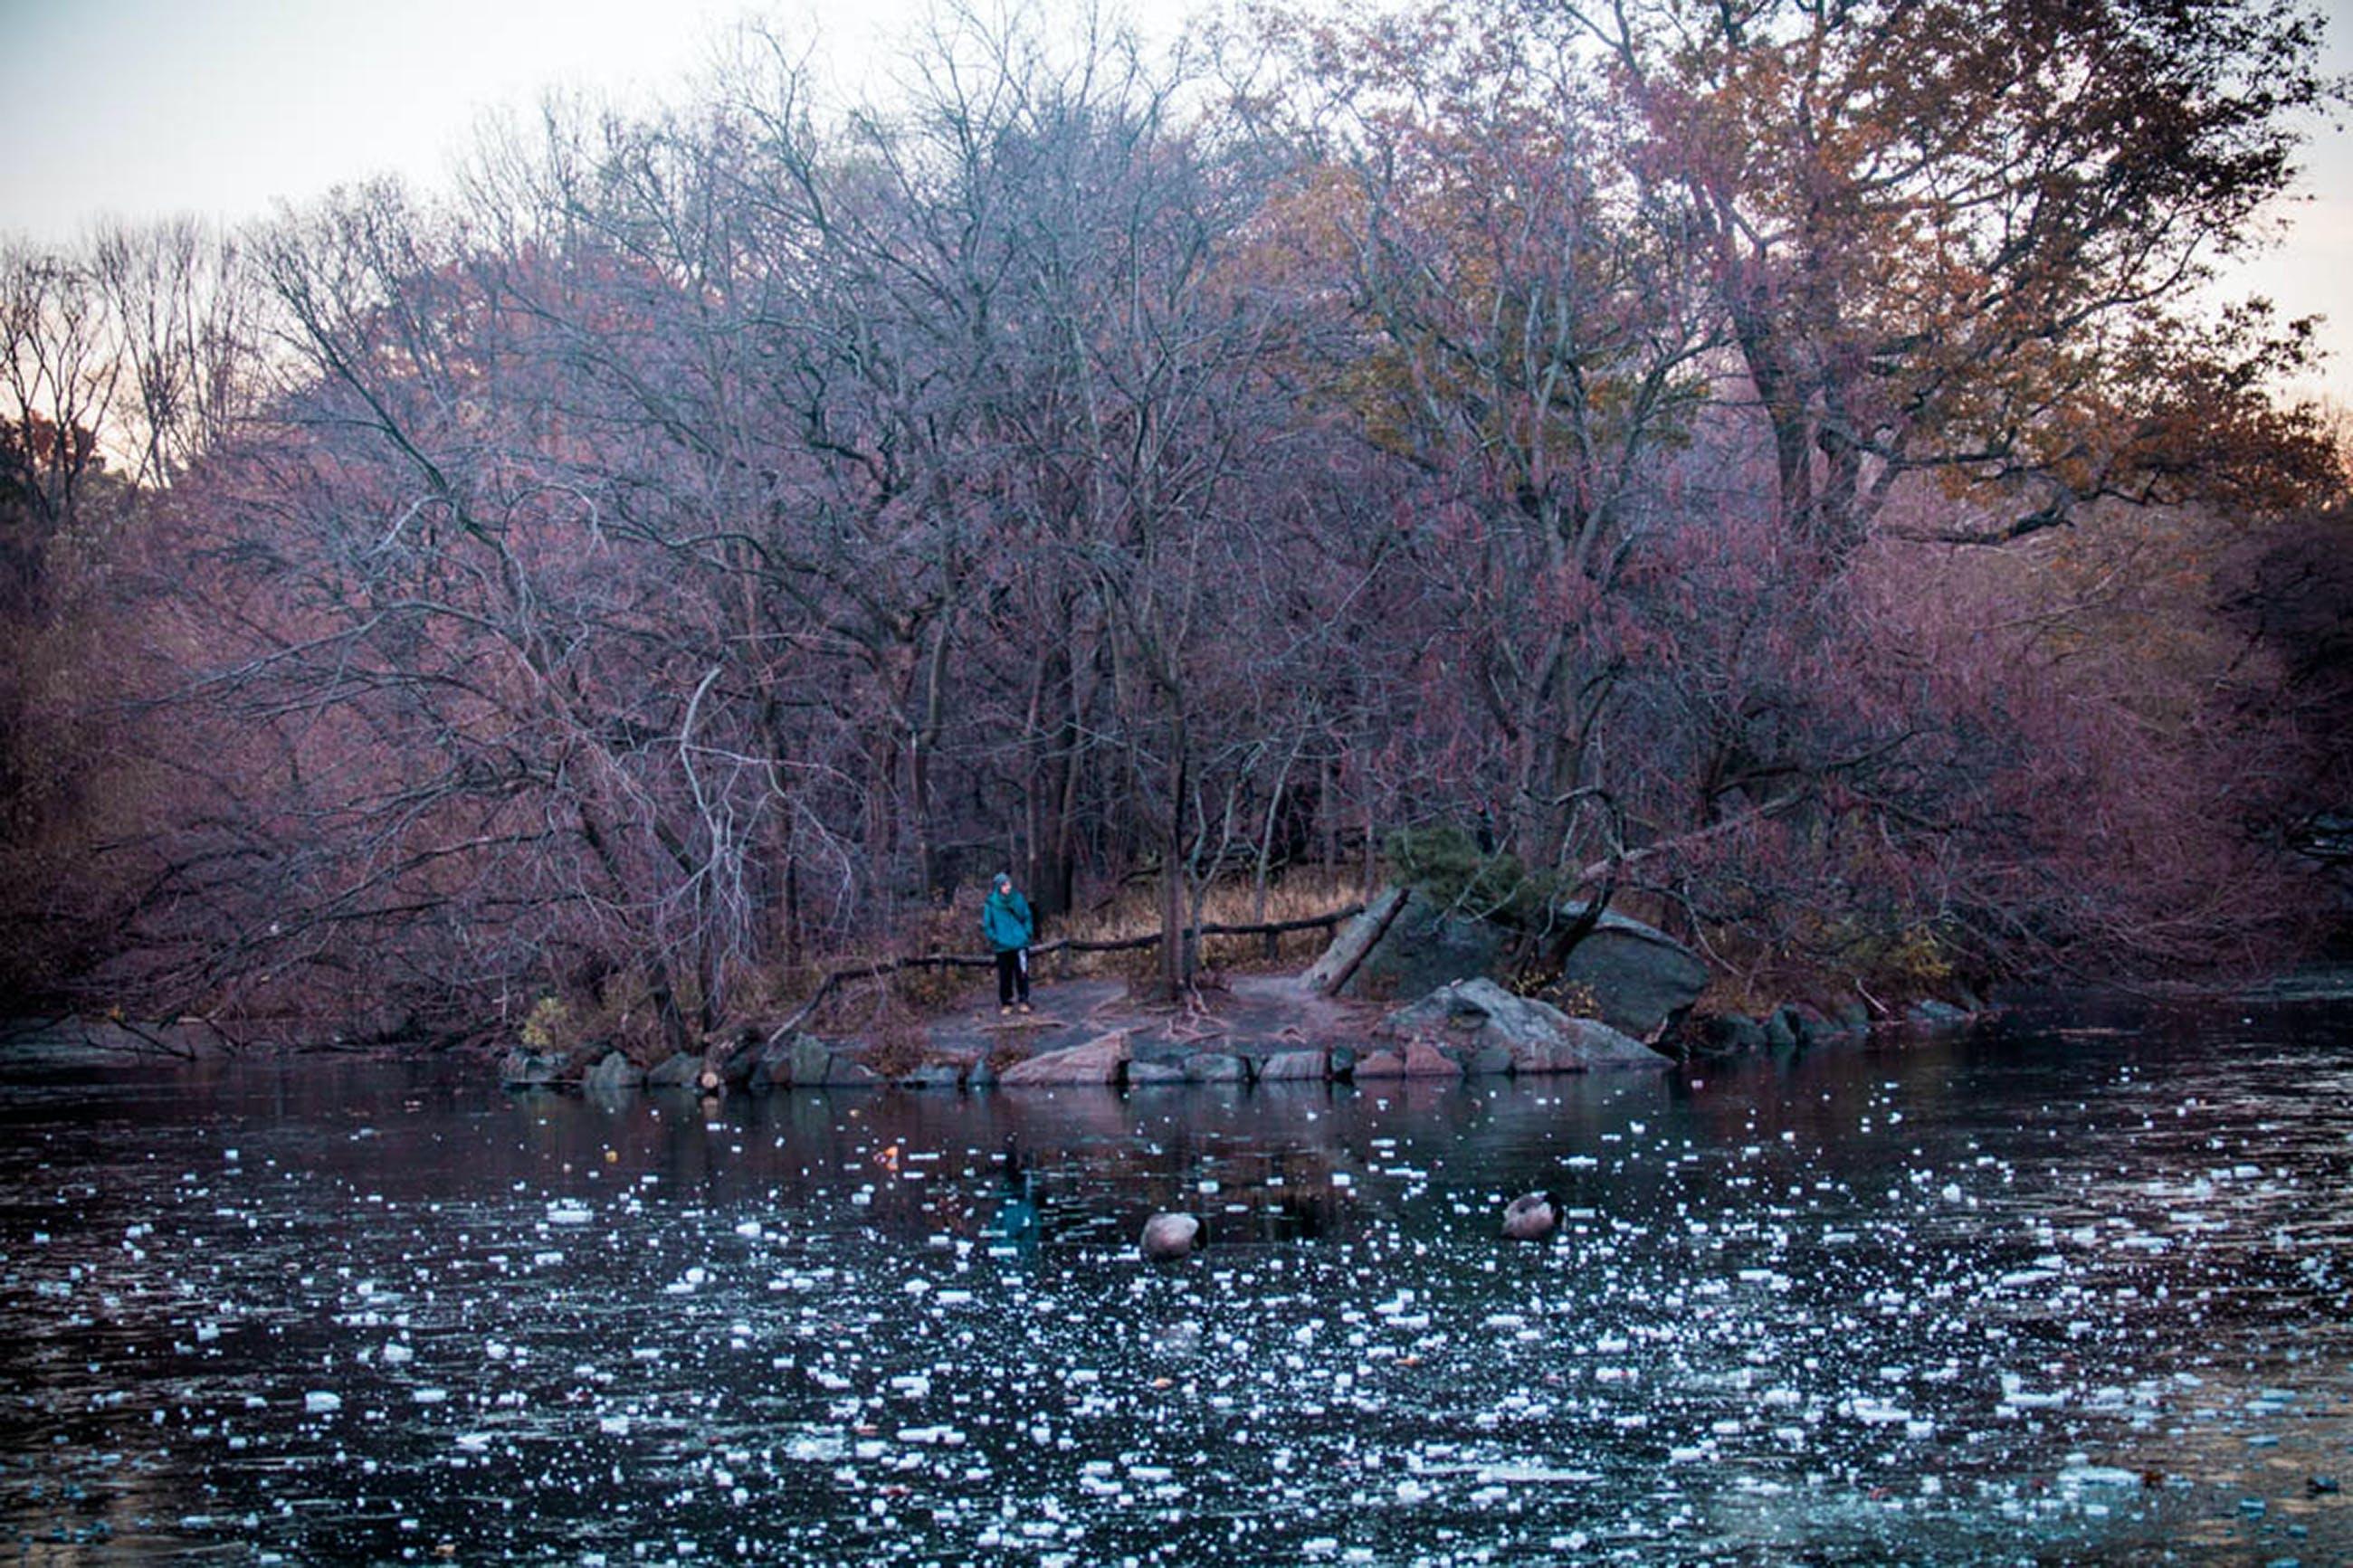 Free stock photo of #bethesda, #bethesdafountain, #centralpark, #cityparks